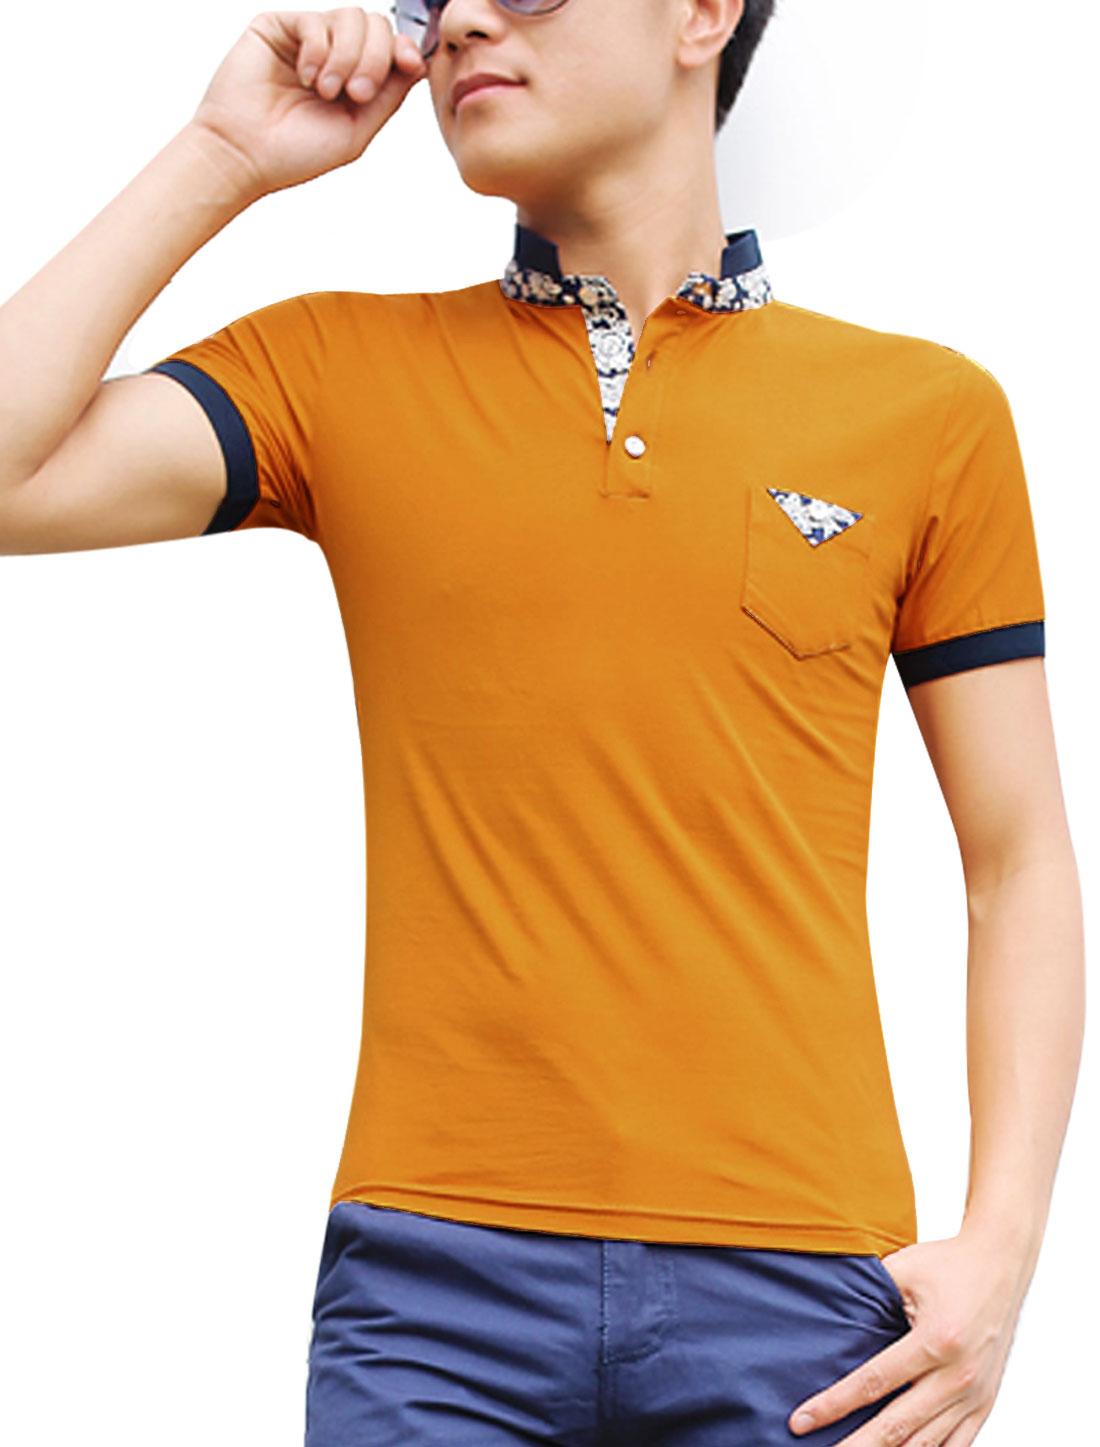 PL03 Men Slim Fit Short Sleeve Detail Polo Shirt Ochre XXL/M (US 38)